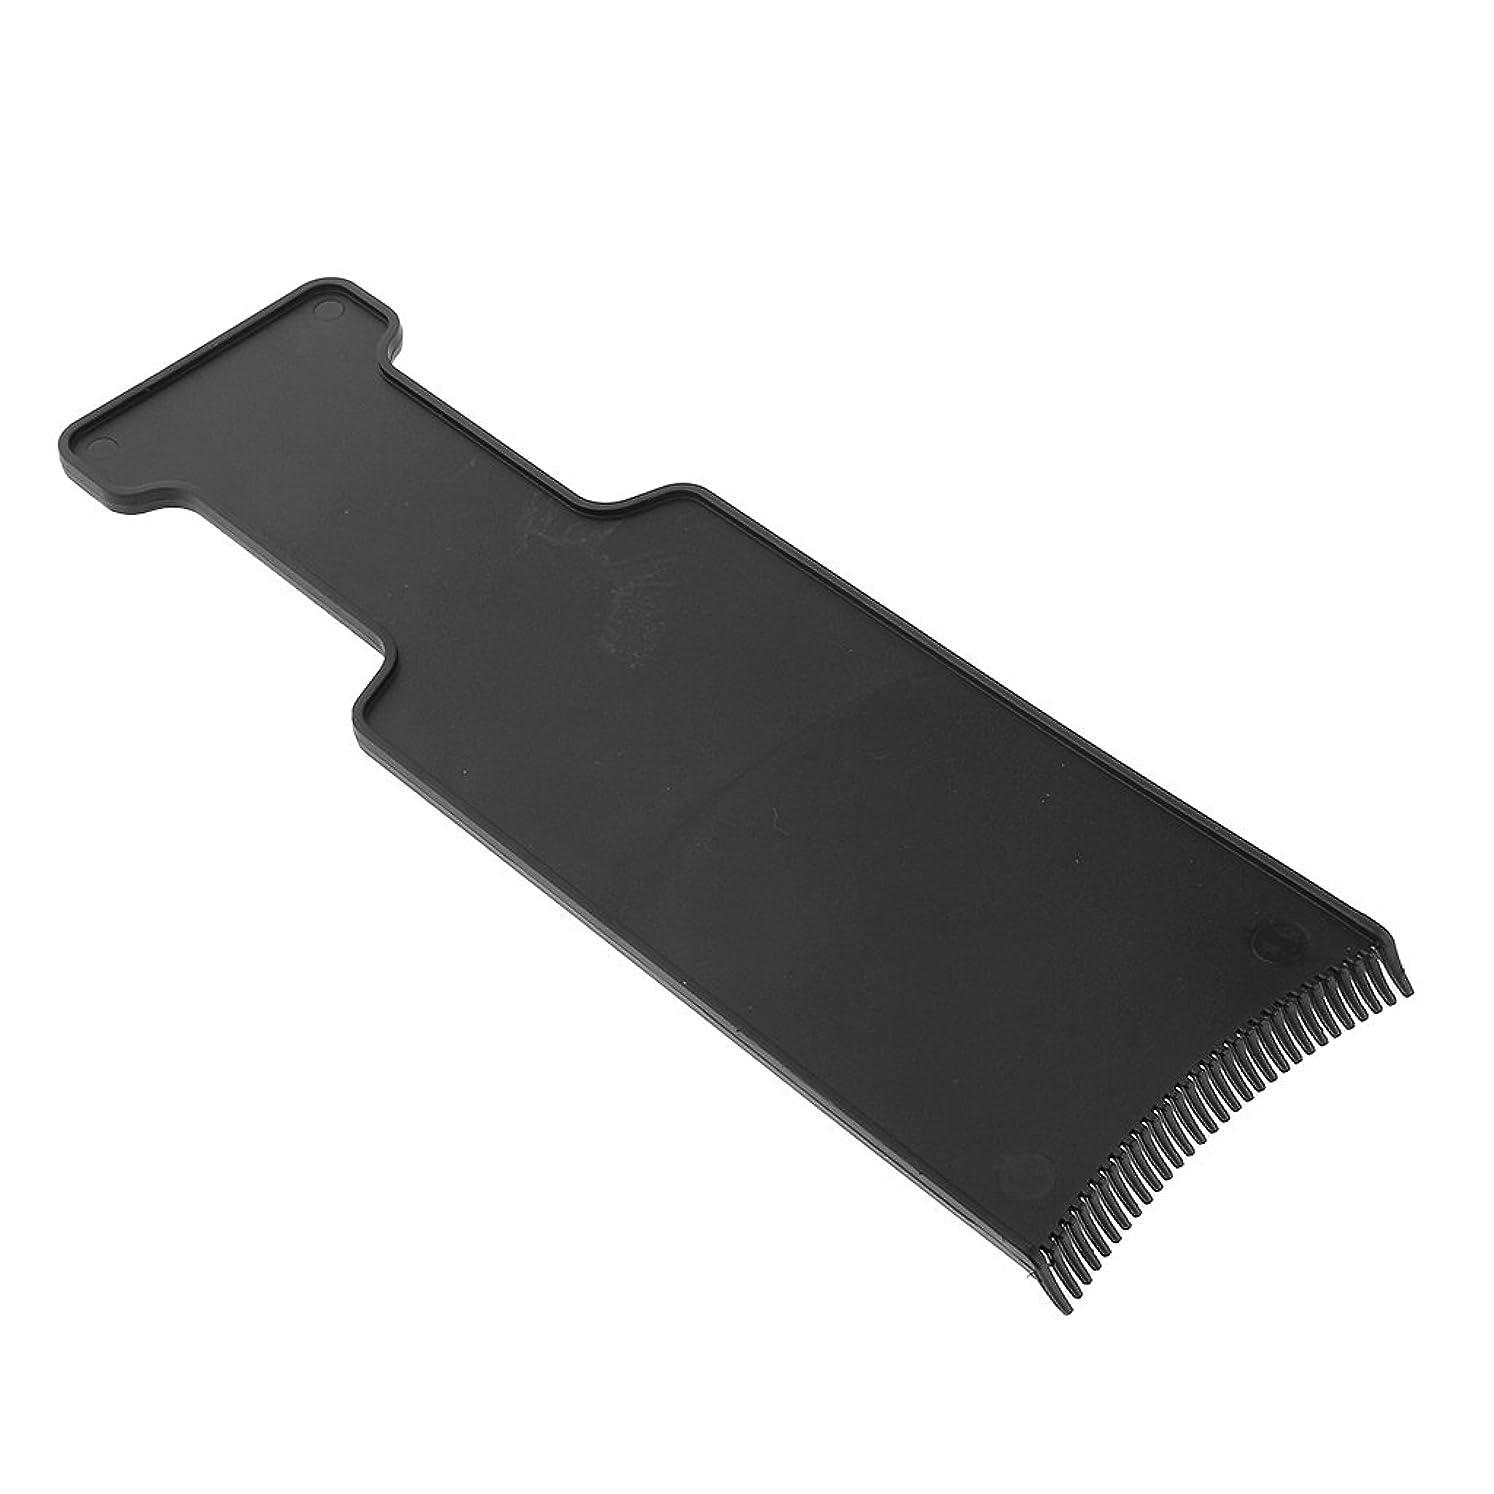 Homyl ヘアカラー ボード 染色 ツール ブラック 全4サイズ - M